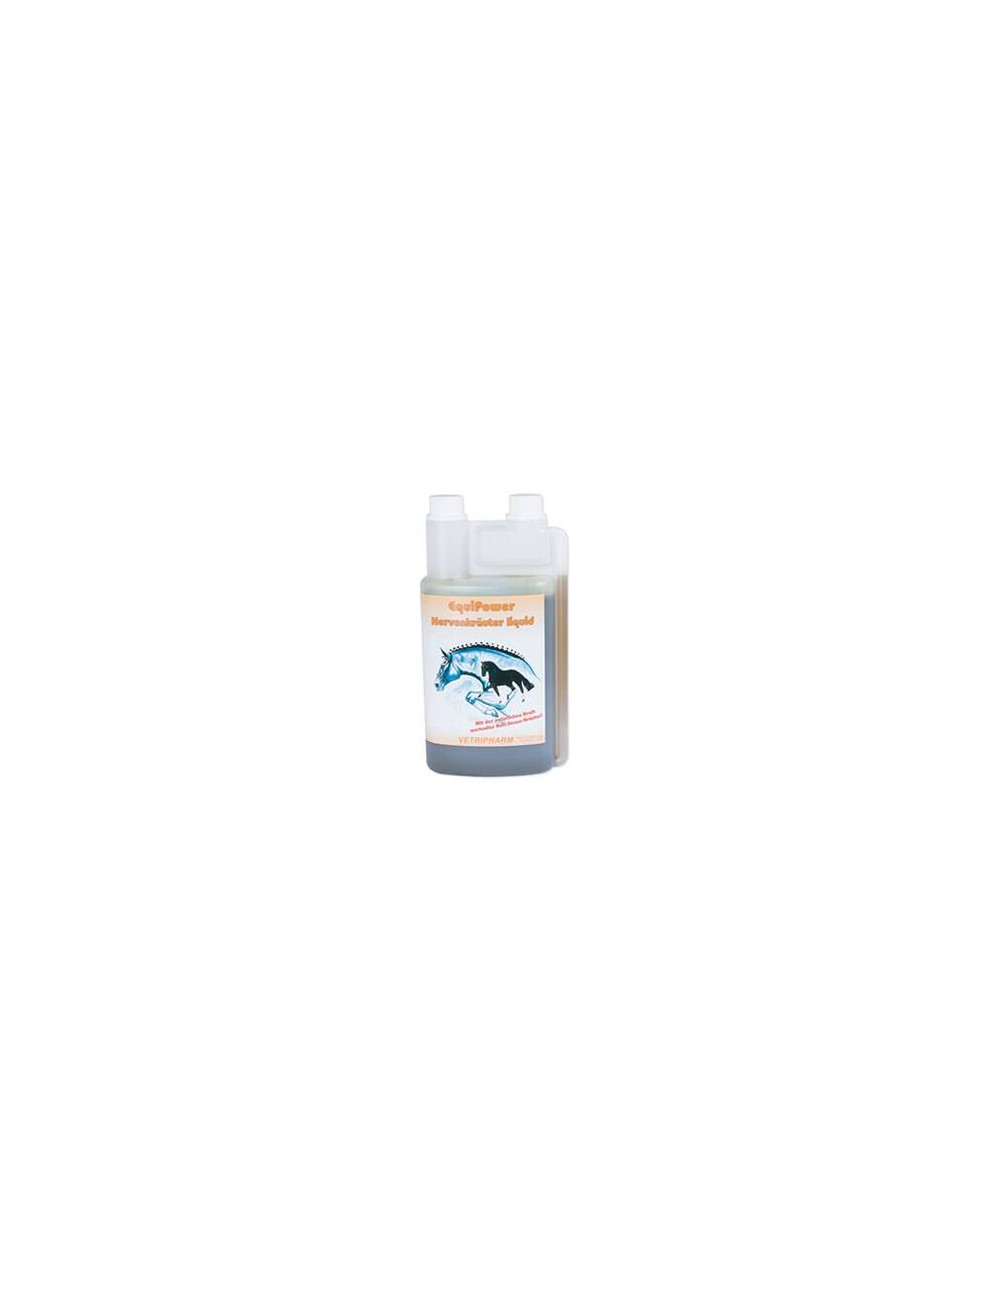 EquiPower - Nervenkräuter liquid